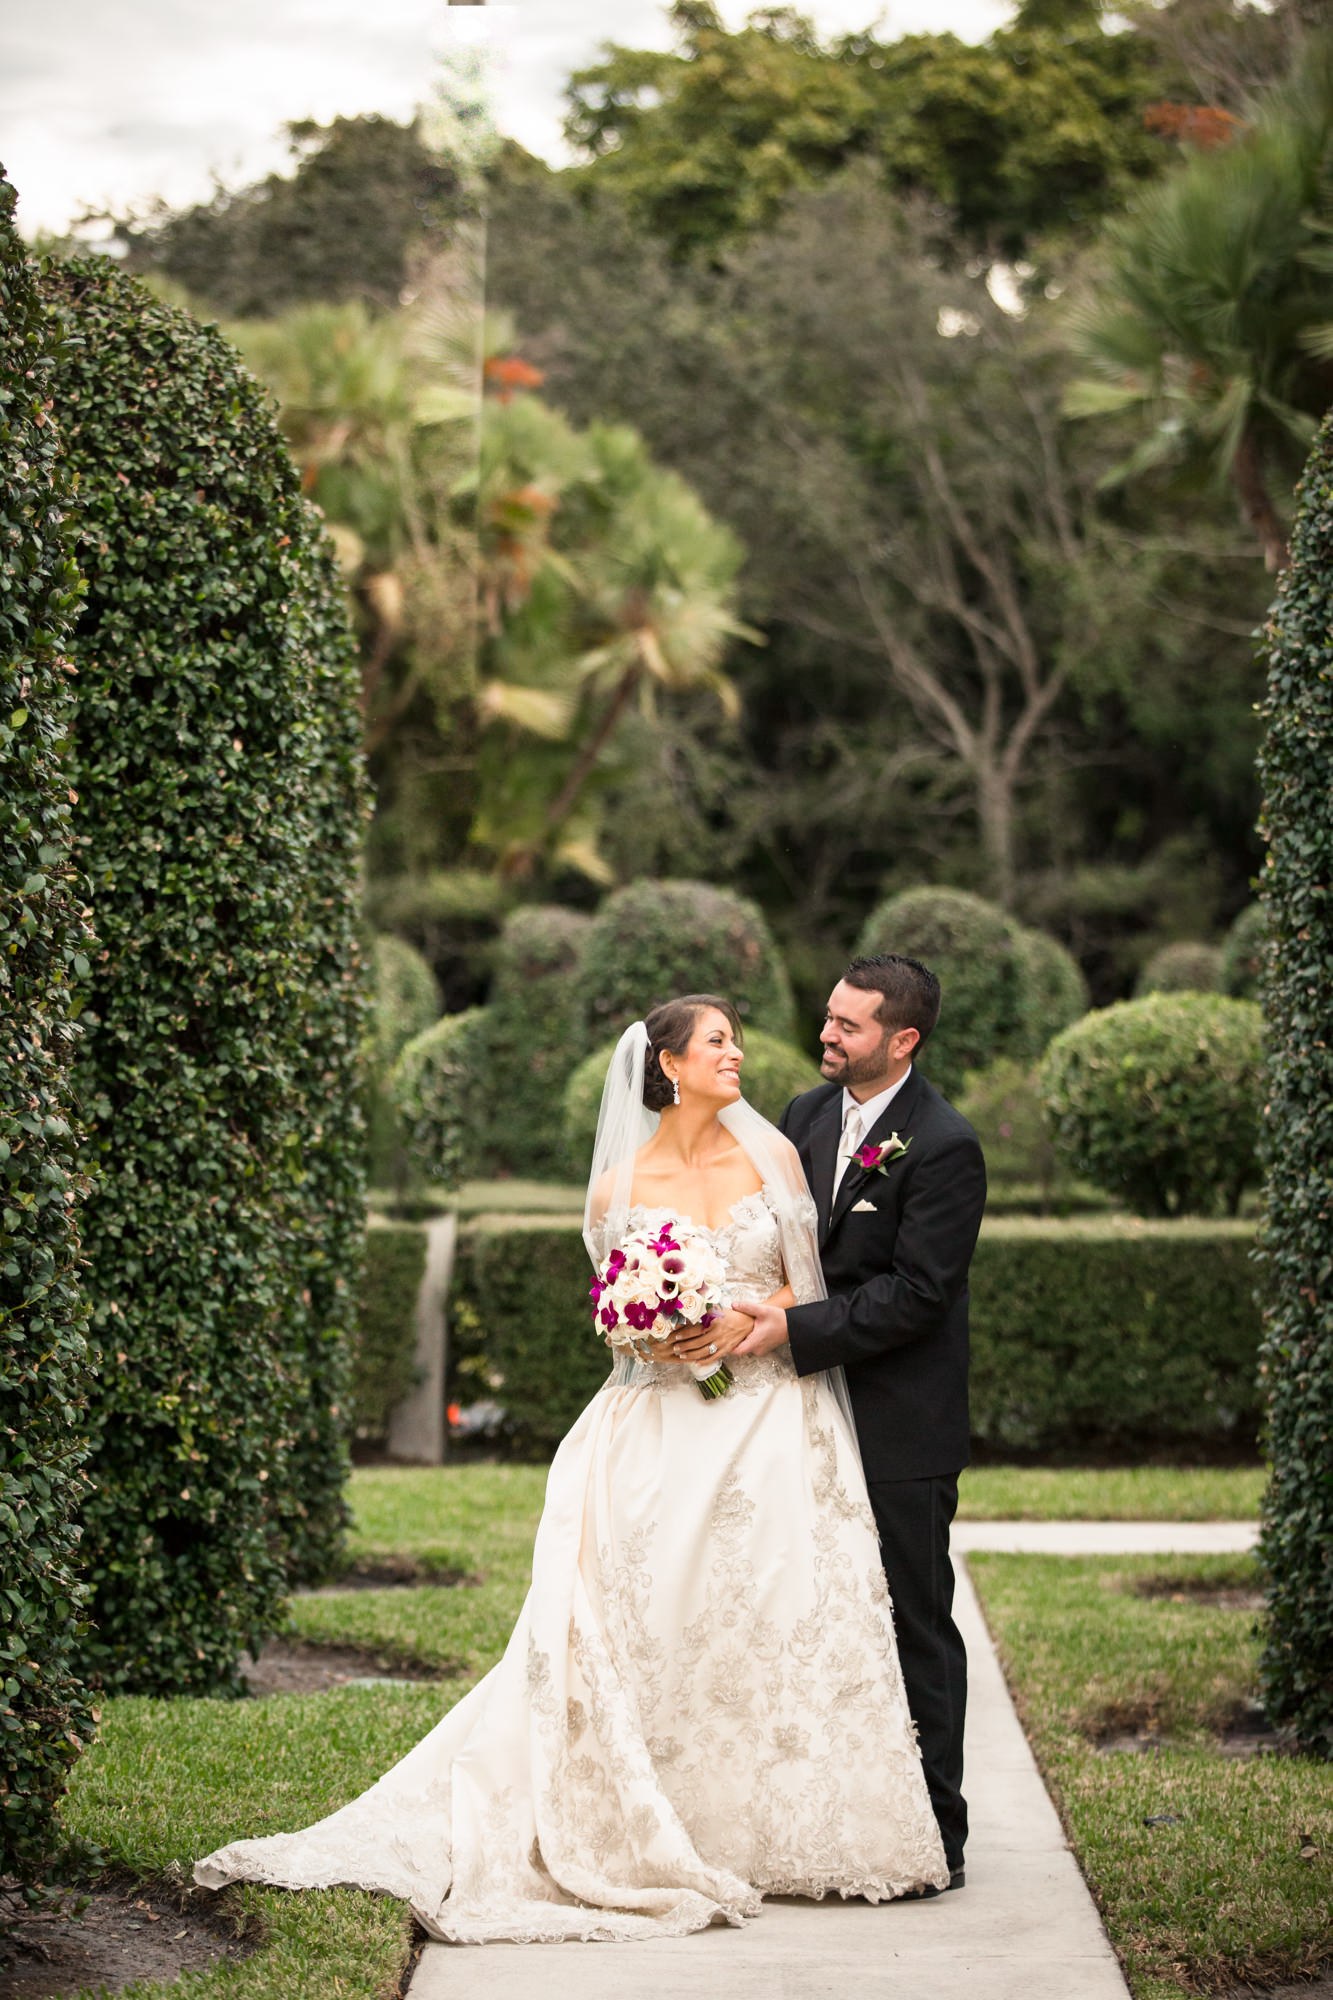 Benvenuto_Wedding_catholic_Florida_Bride-Groom-88.jpg